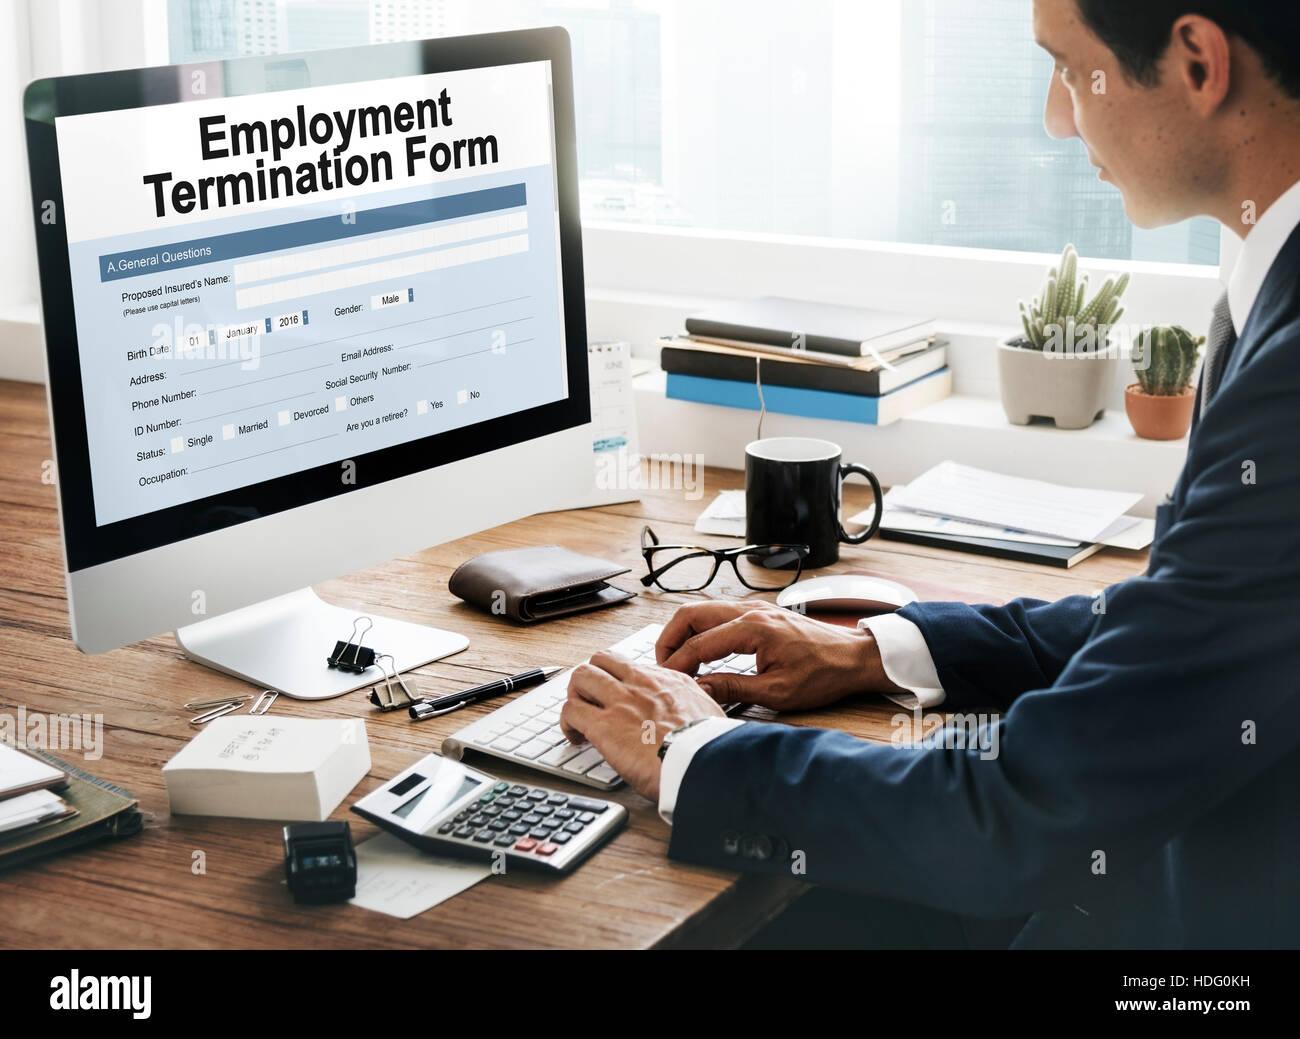 Beschäftigung Kündigung Formular Dokument Konzept Stockfoto Bild